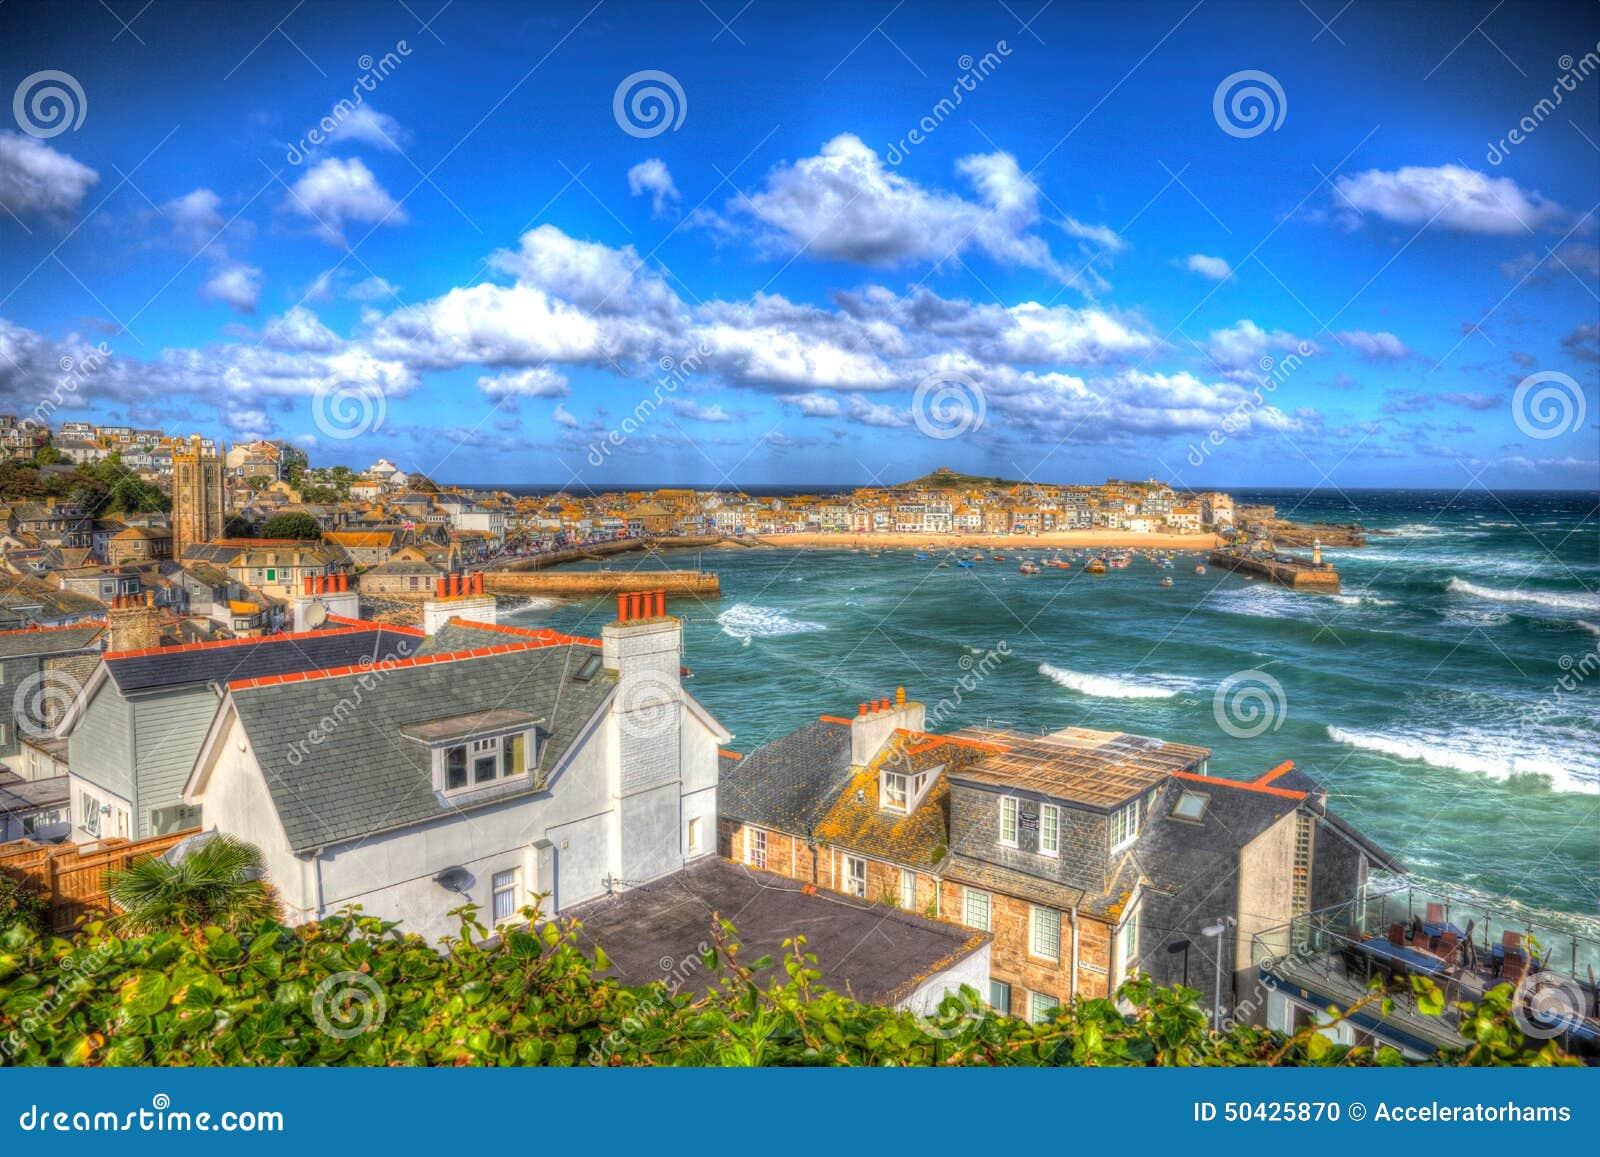 St Ives havencornwall Engeland het UK blauwe overzees en hemel in kleurrijk HDR